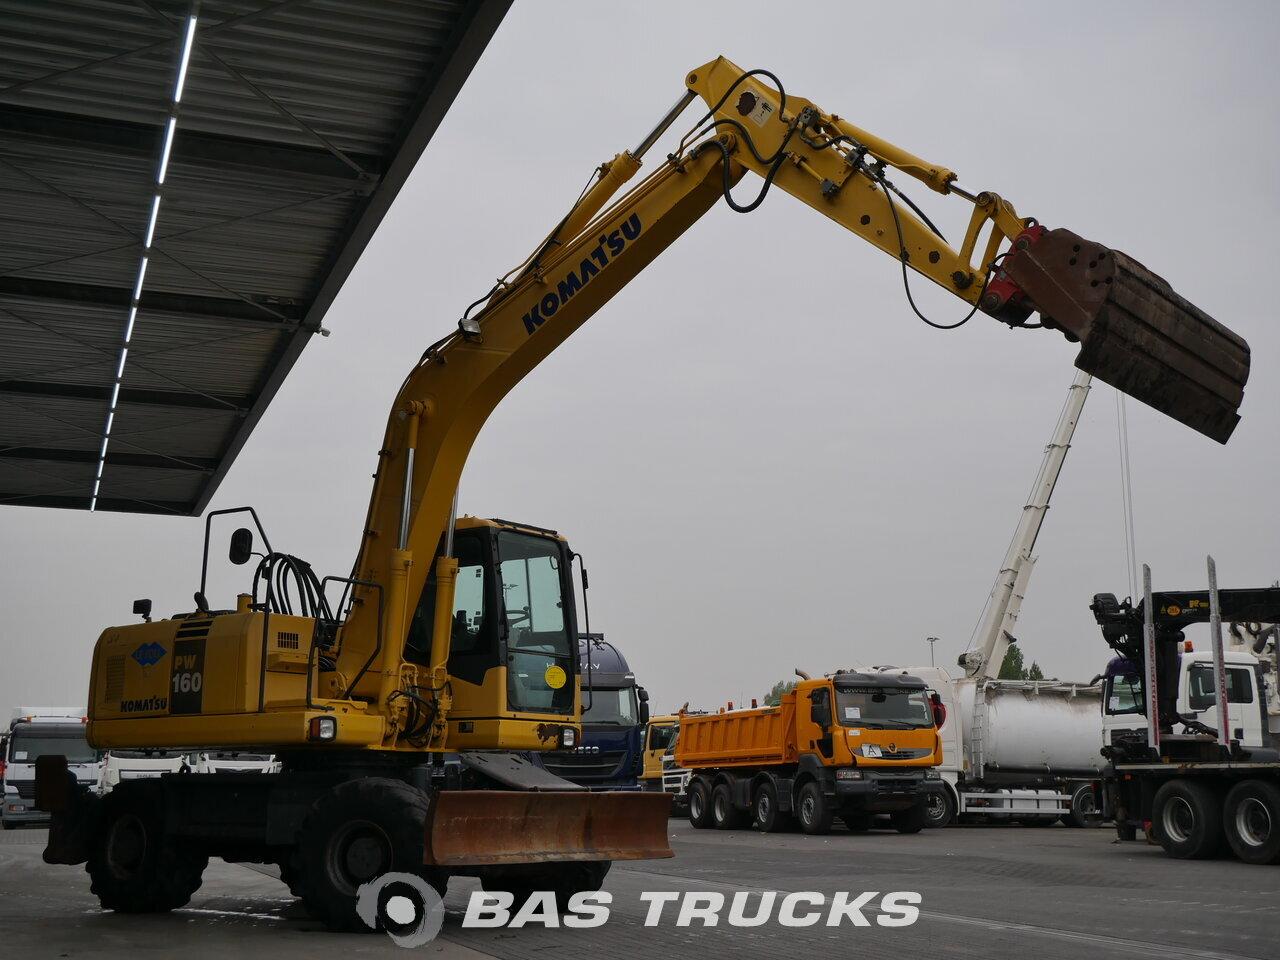 photo de Occasion Machine de construction Komatsu PW160 ES-7K Wheel Excavator 4X4 2004